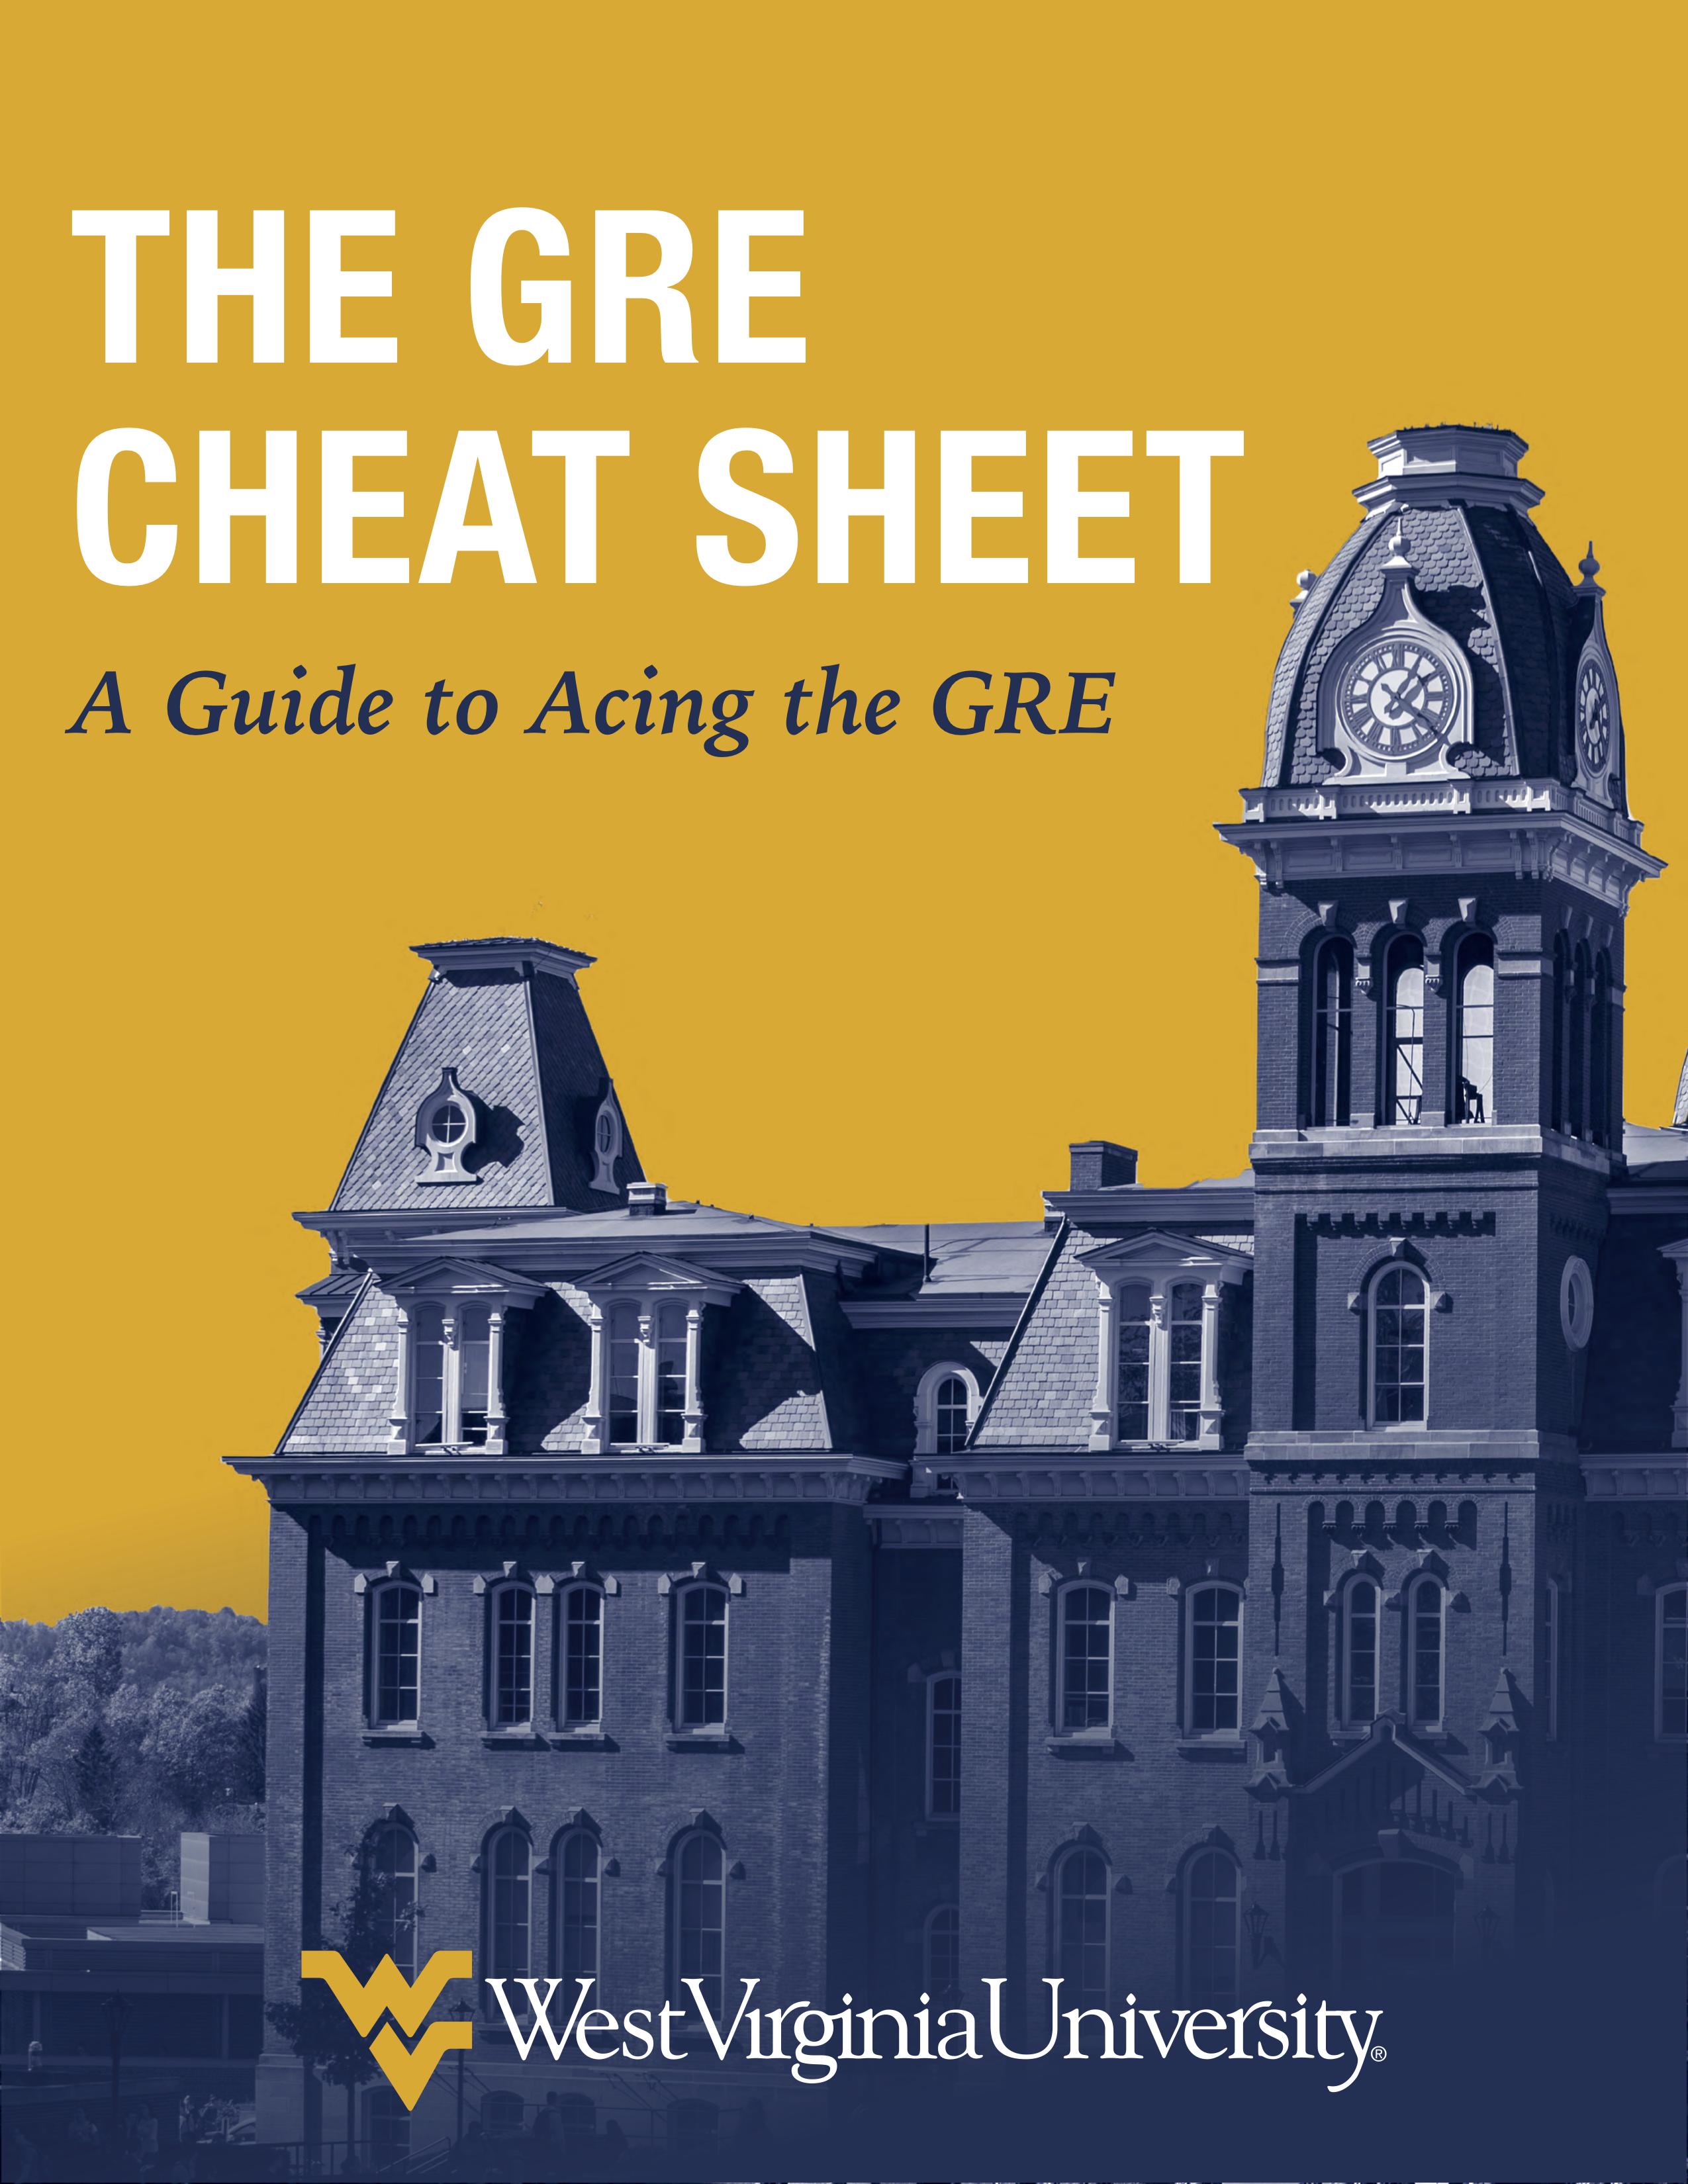 WVU GRE Cheat Sheet REVAMP 2.0 p1